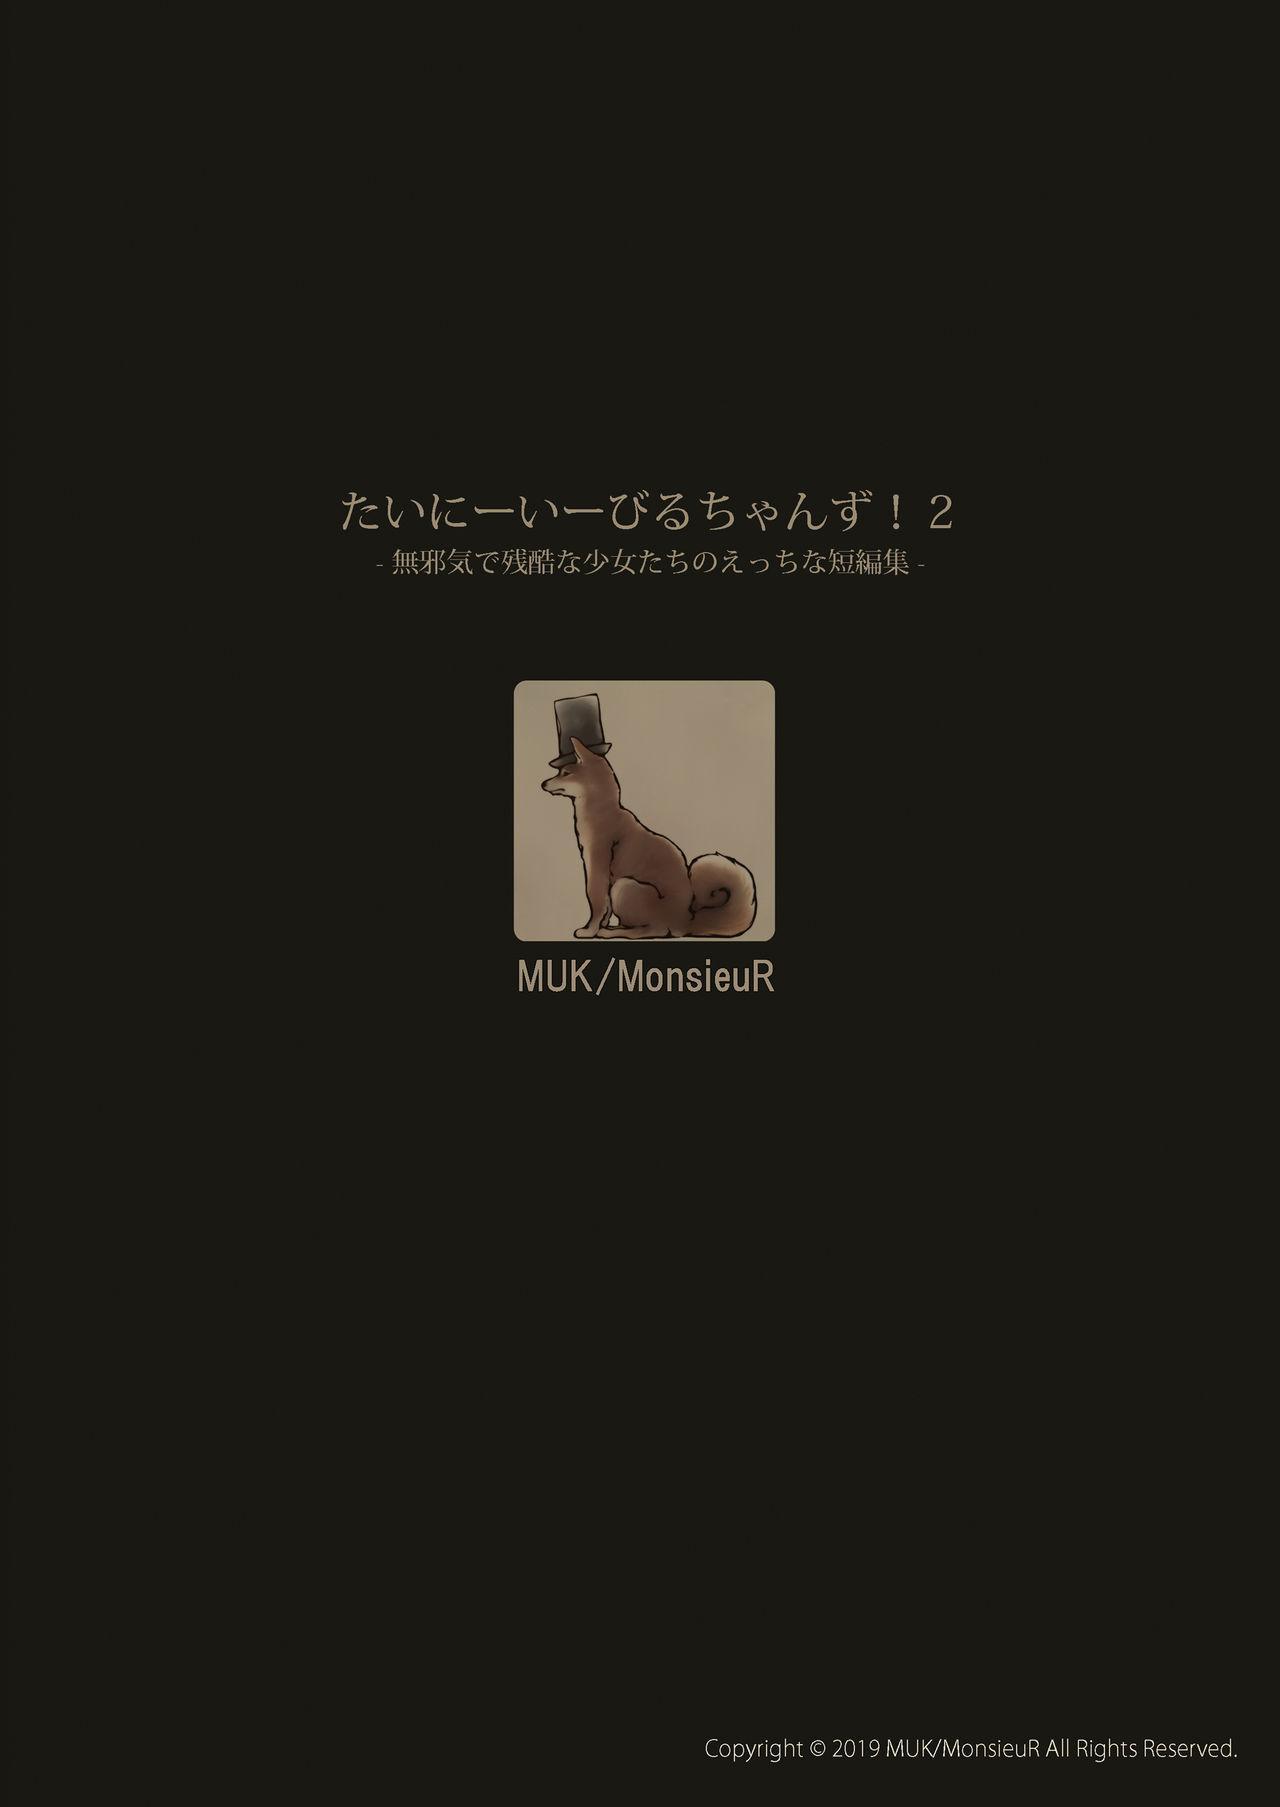 [MonsieuR (MUK)] Tiny Evil chans! 2 -Mujaki de Zankoku na Shoujo-tachi no Ecchi na Tanpenshuu- [English] {Hennojin} [Decensored] [Digital] 19